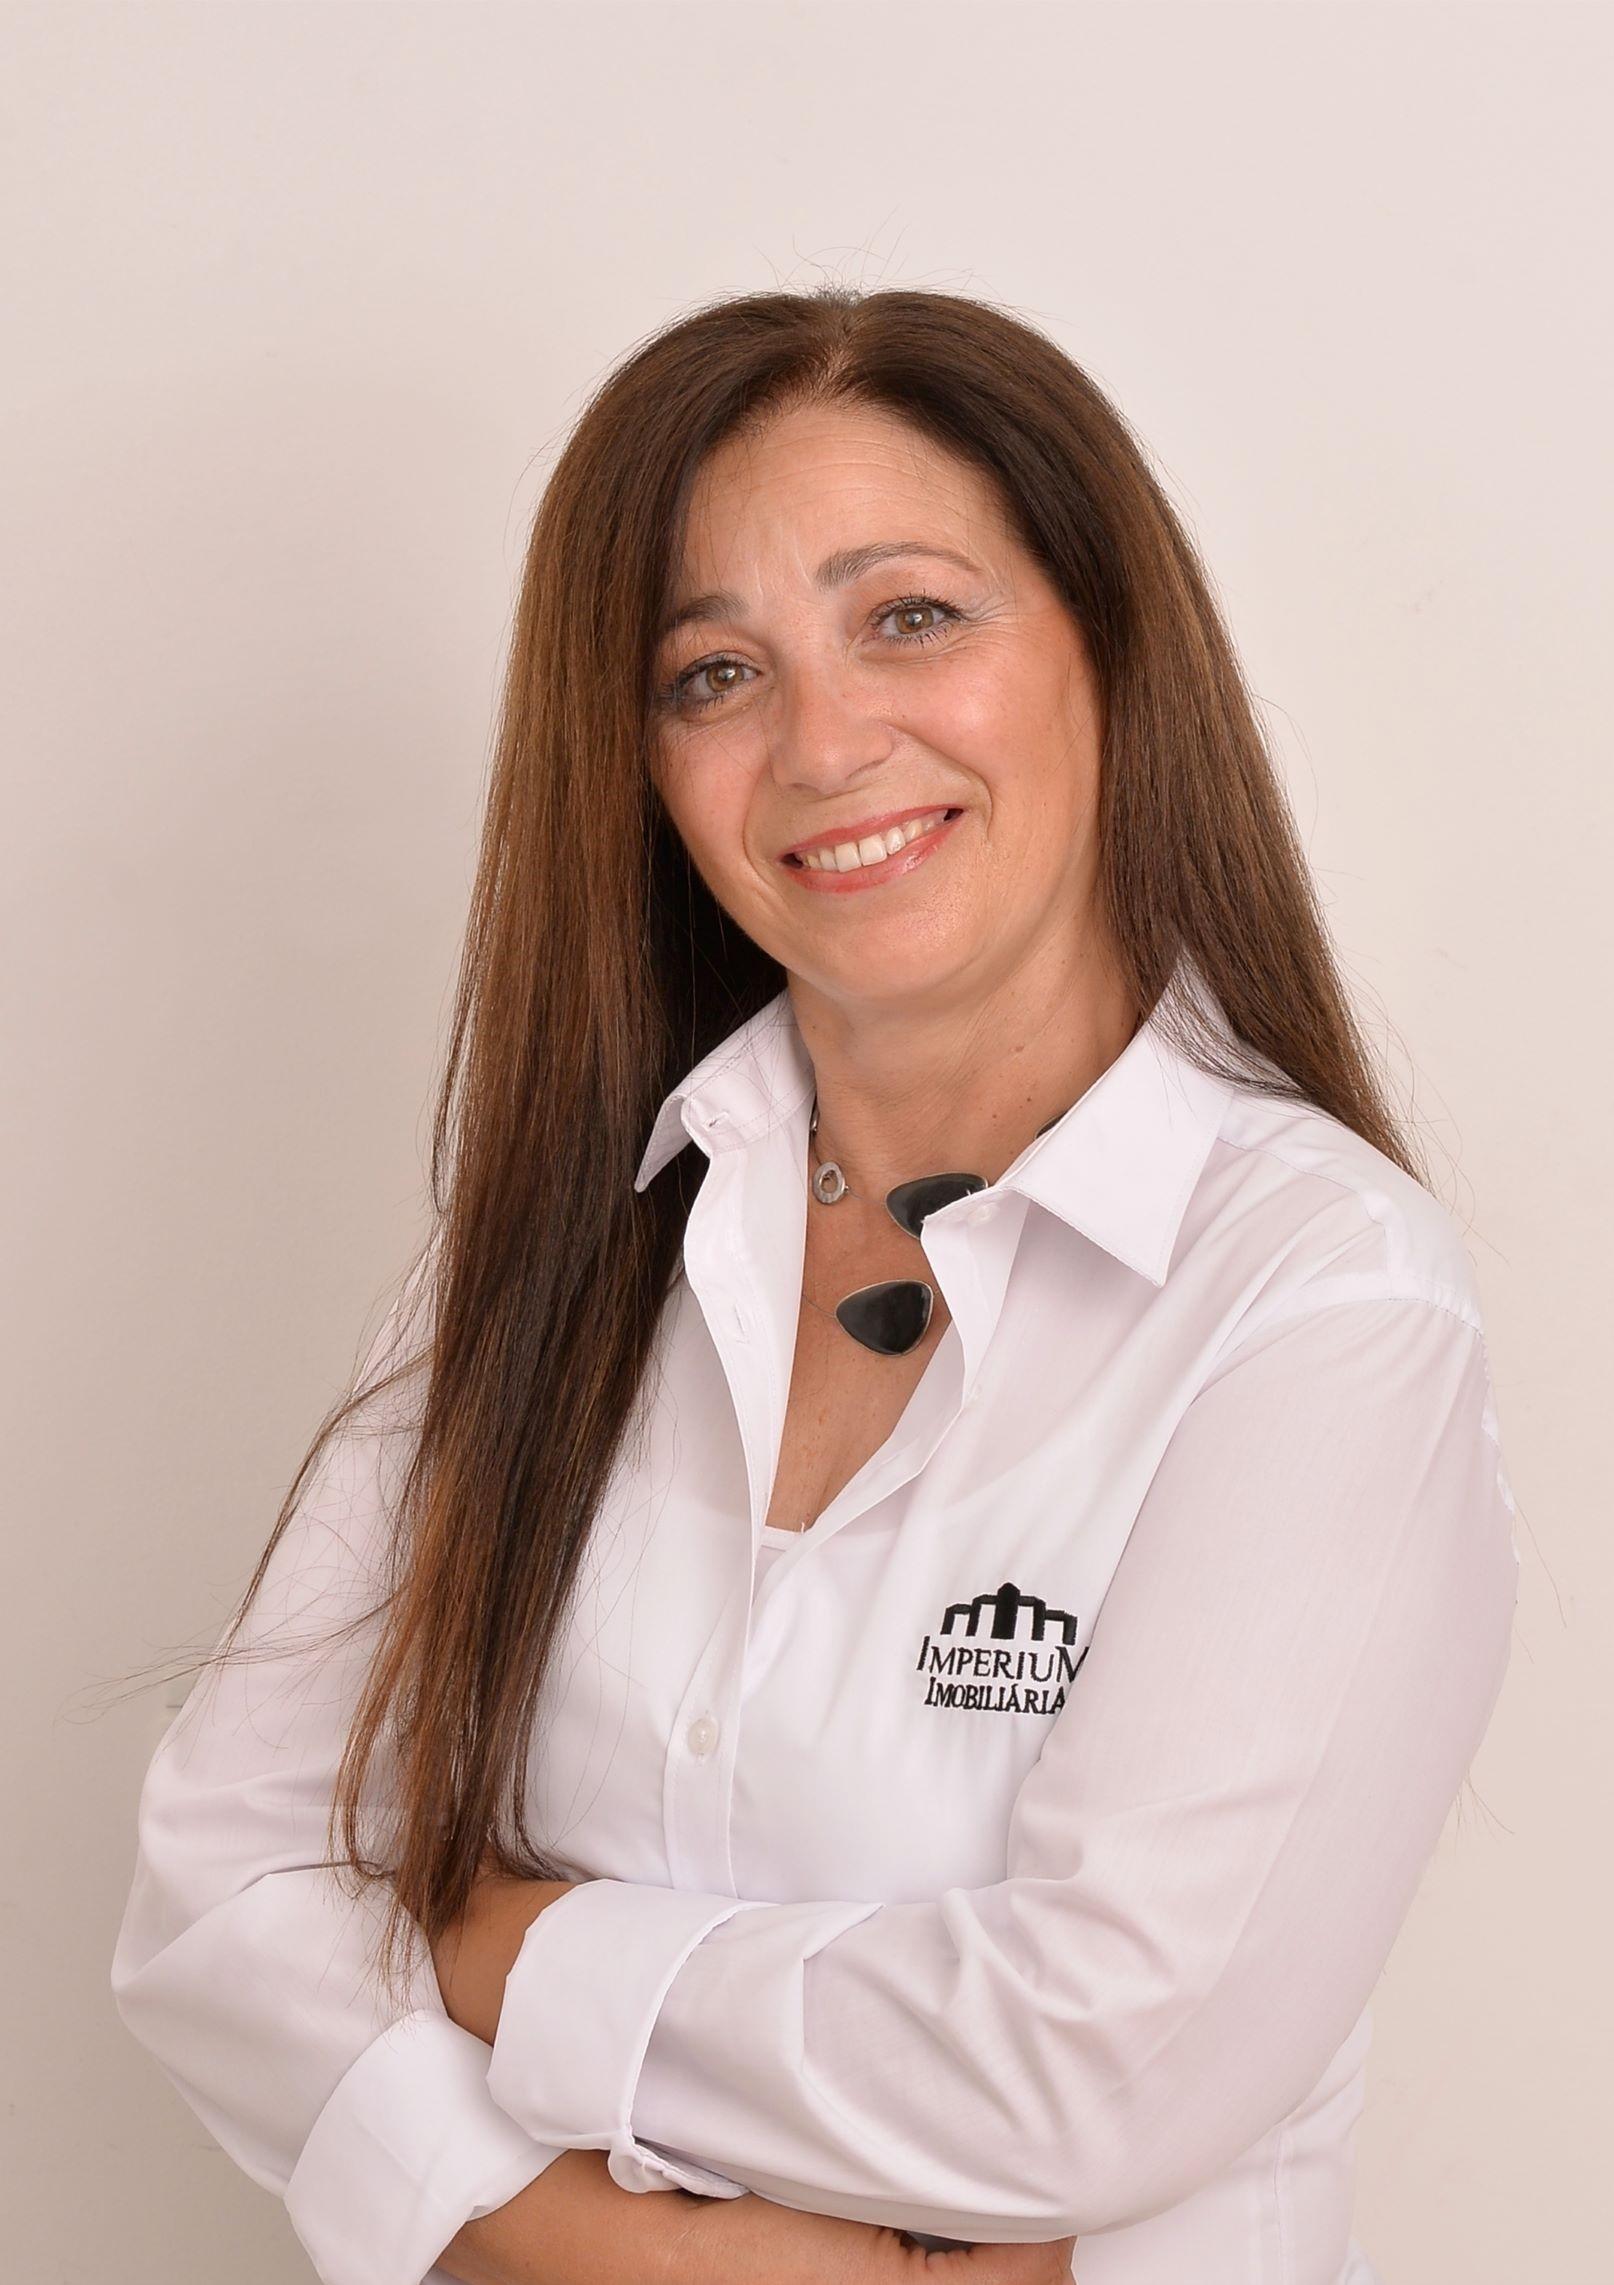 Rosalina Campos